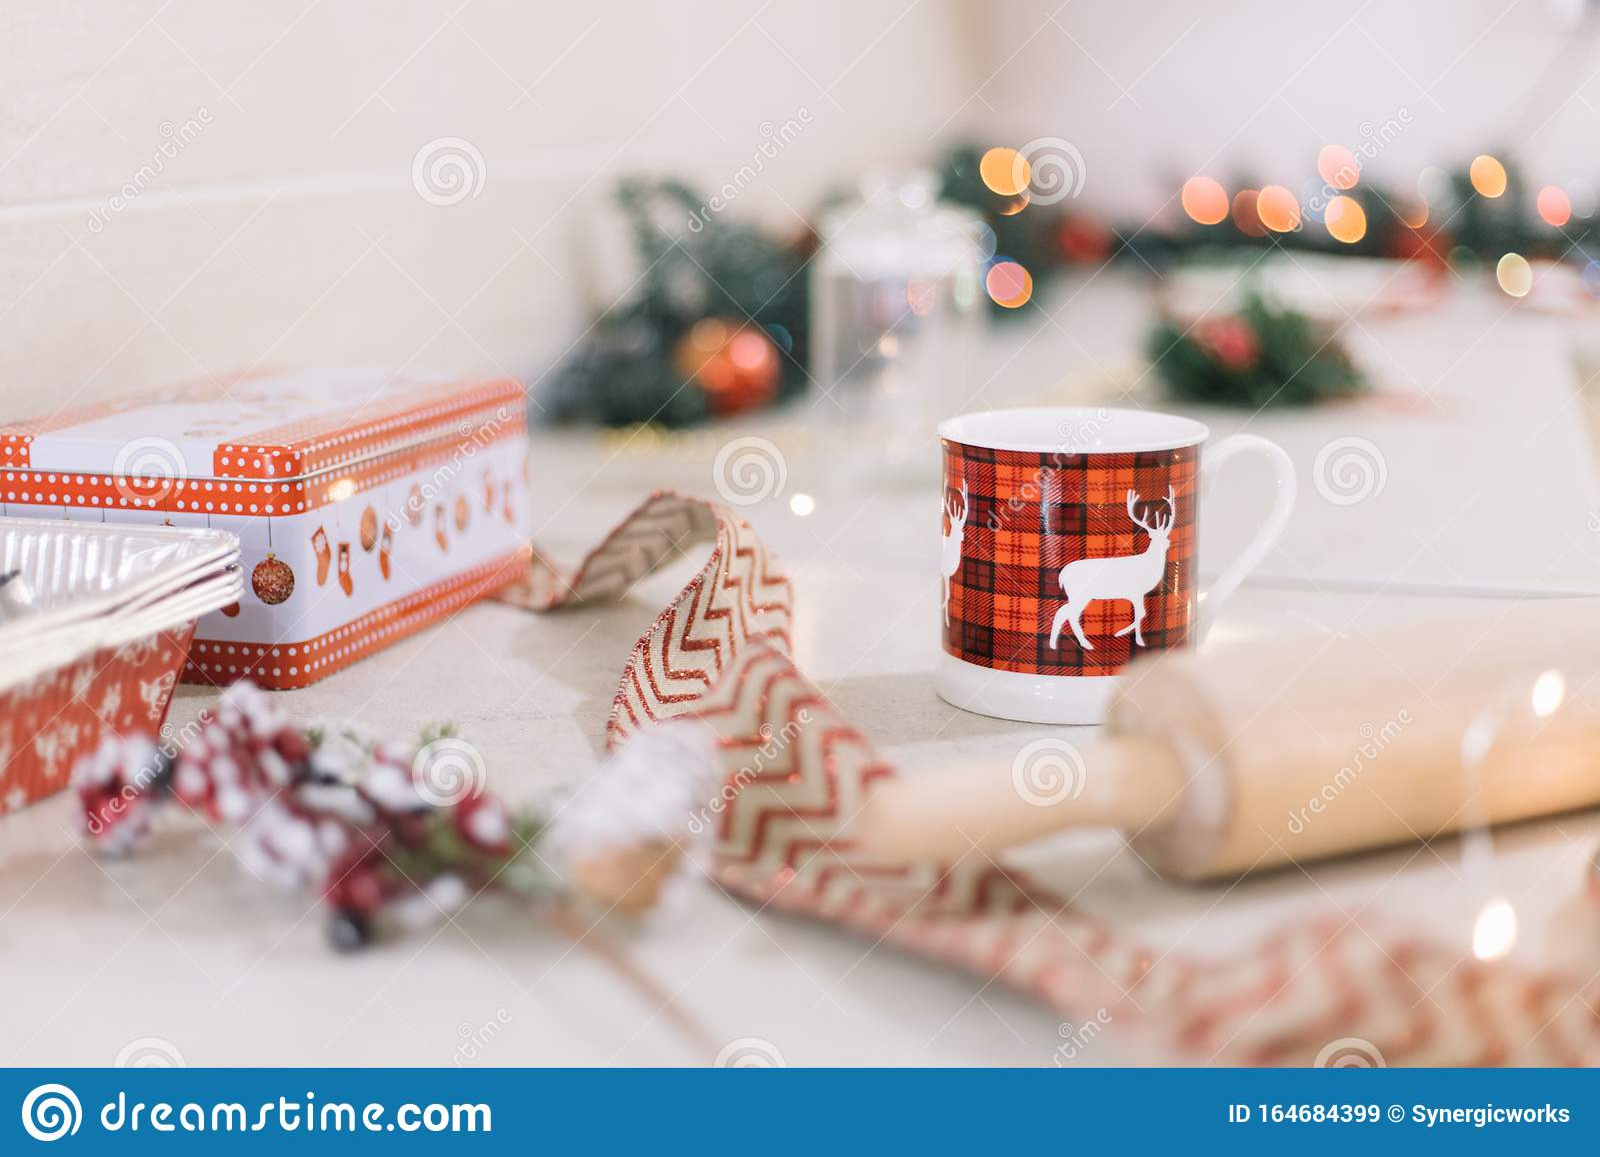 Deer Mug On Decorated Kitchen Bar For Christmas Stock Image Image Of Beautiful Background 164684399